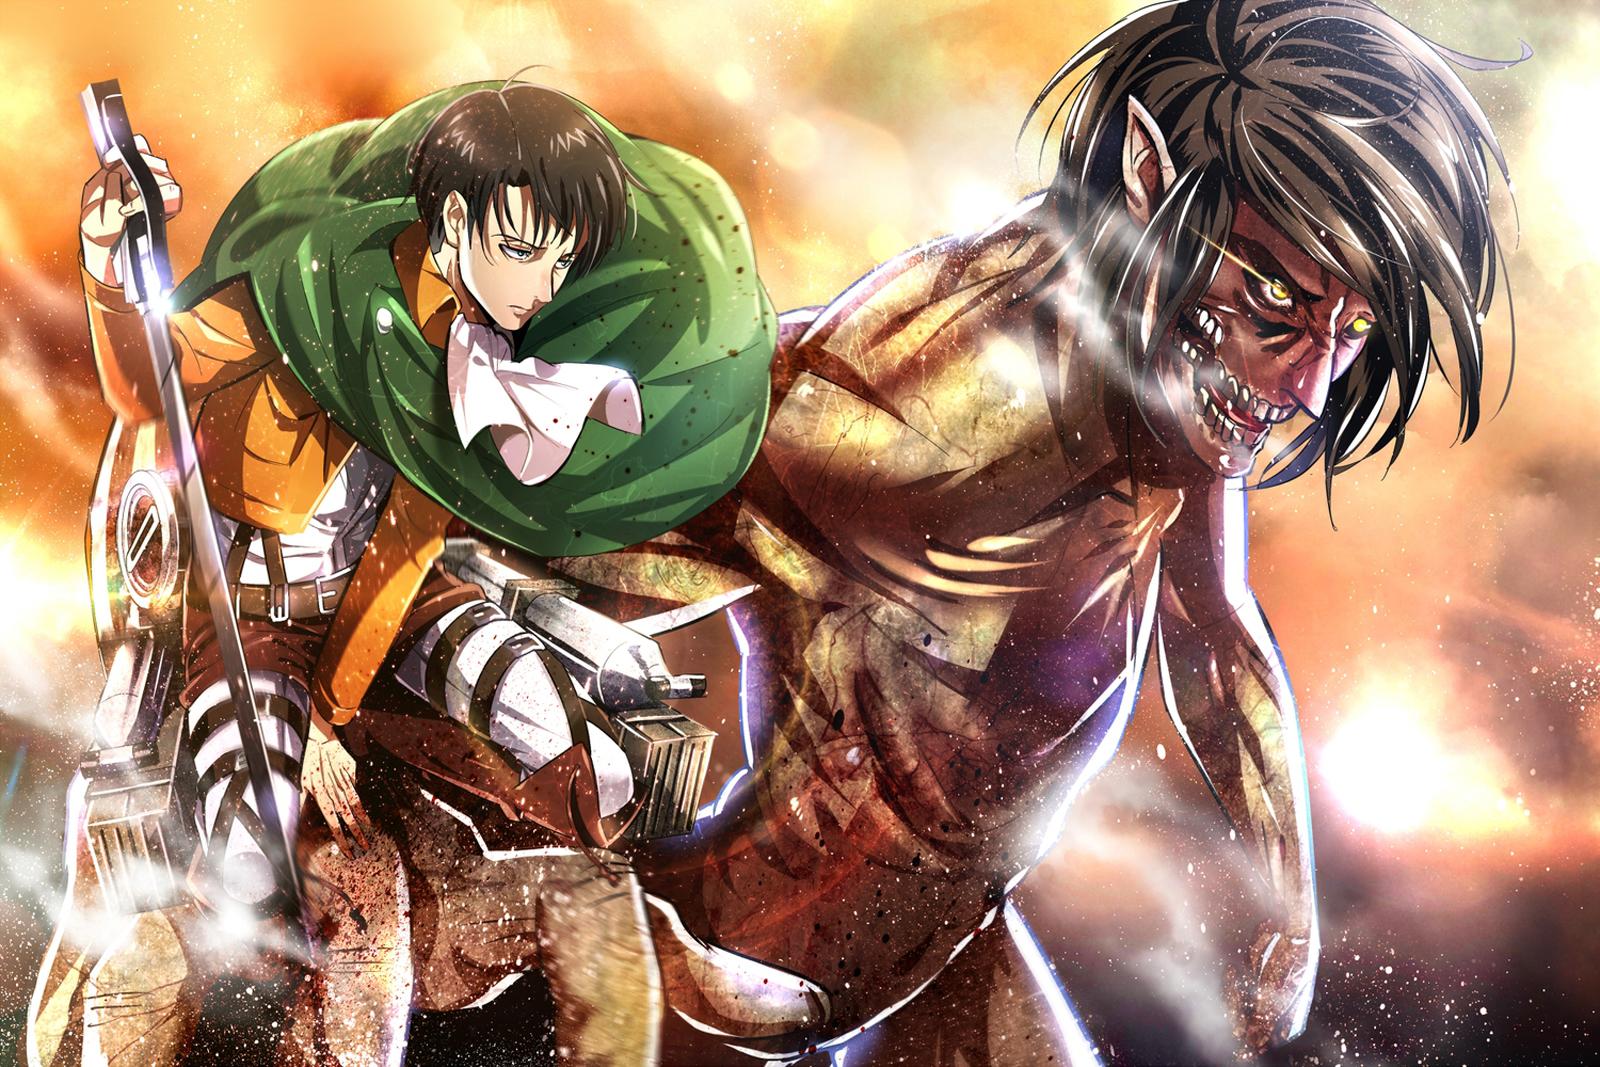 Free Download Attack On Titan Shingeki No Kyojin Levi Rivaille